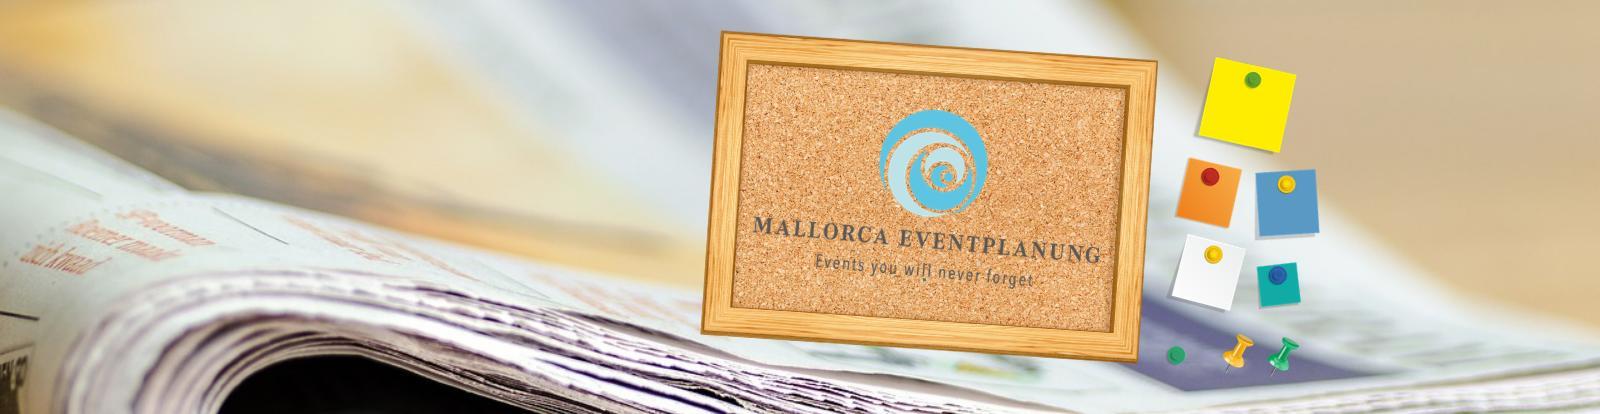 mallorca-event-blog